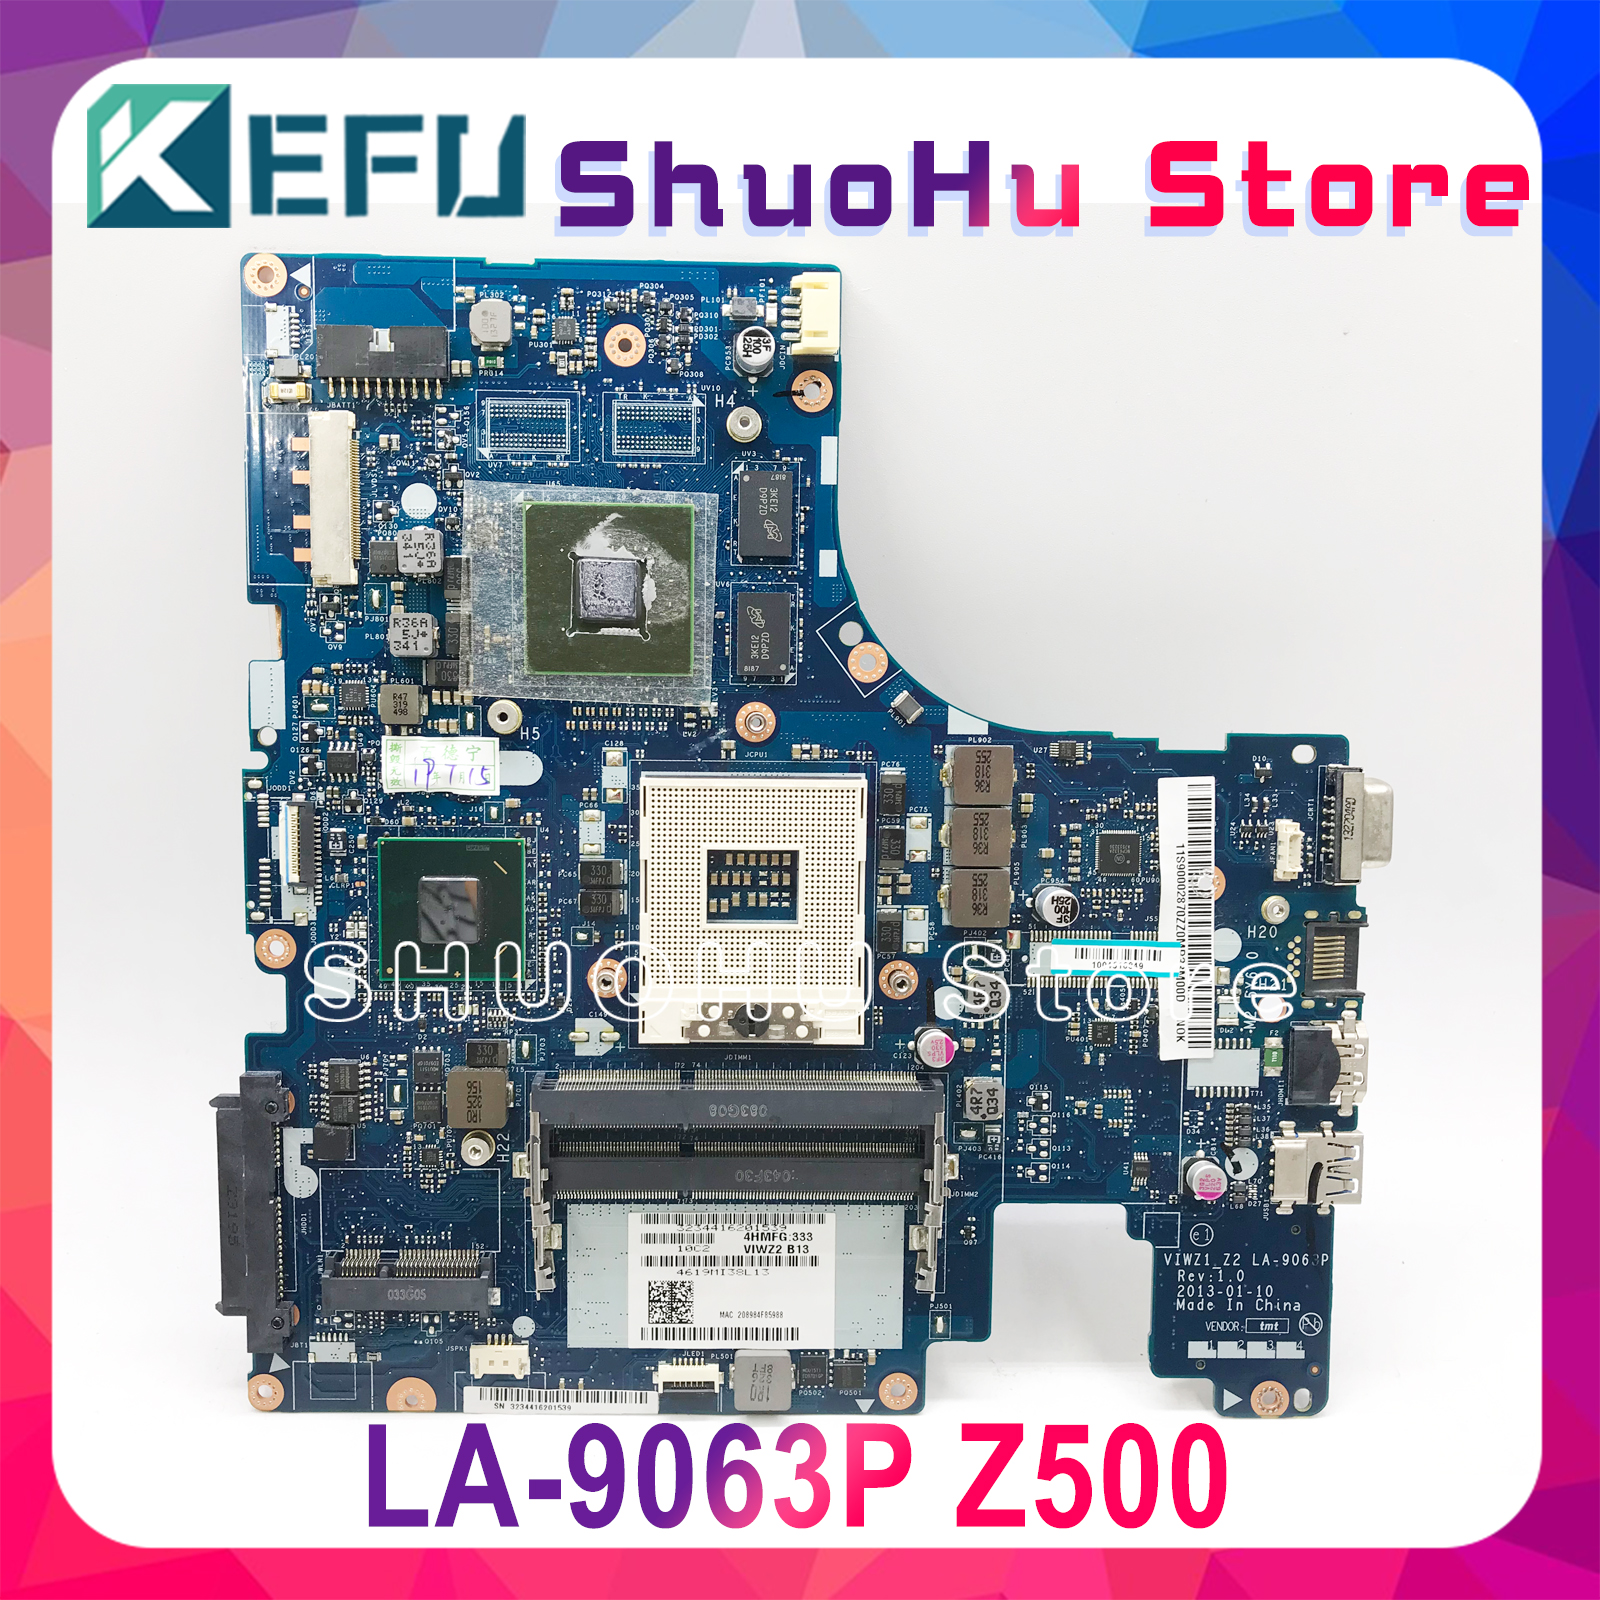 KEFU LA-9063P For Lenovo Z500 Laptop Motherboard VIWZ1-Z2 LA-9063P Z500 With GT740M Original Motherboard 100% Test Work